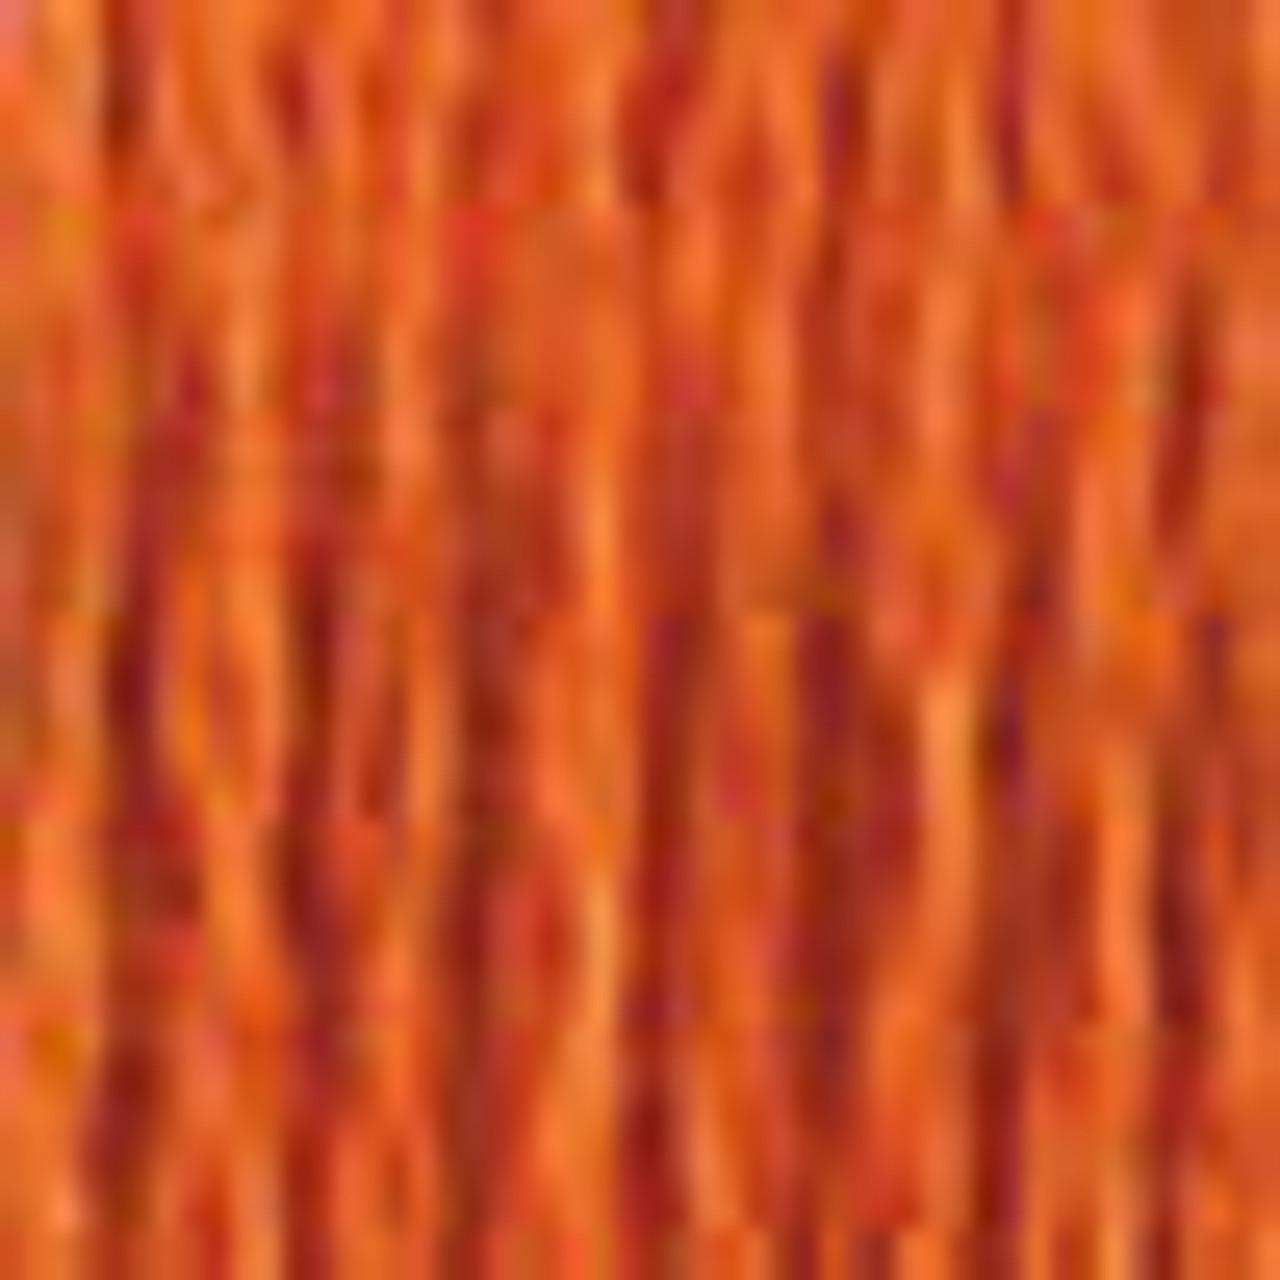 DMC # 920 Medium Copper Floss / Thread